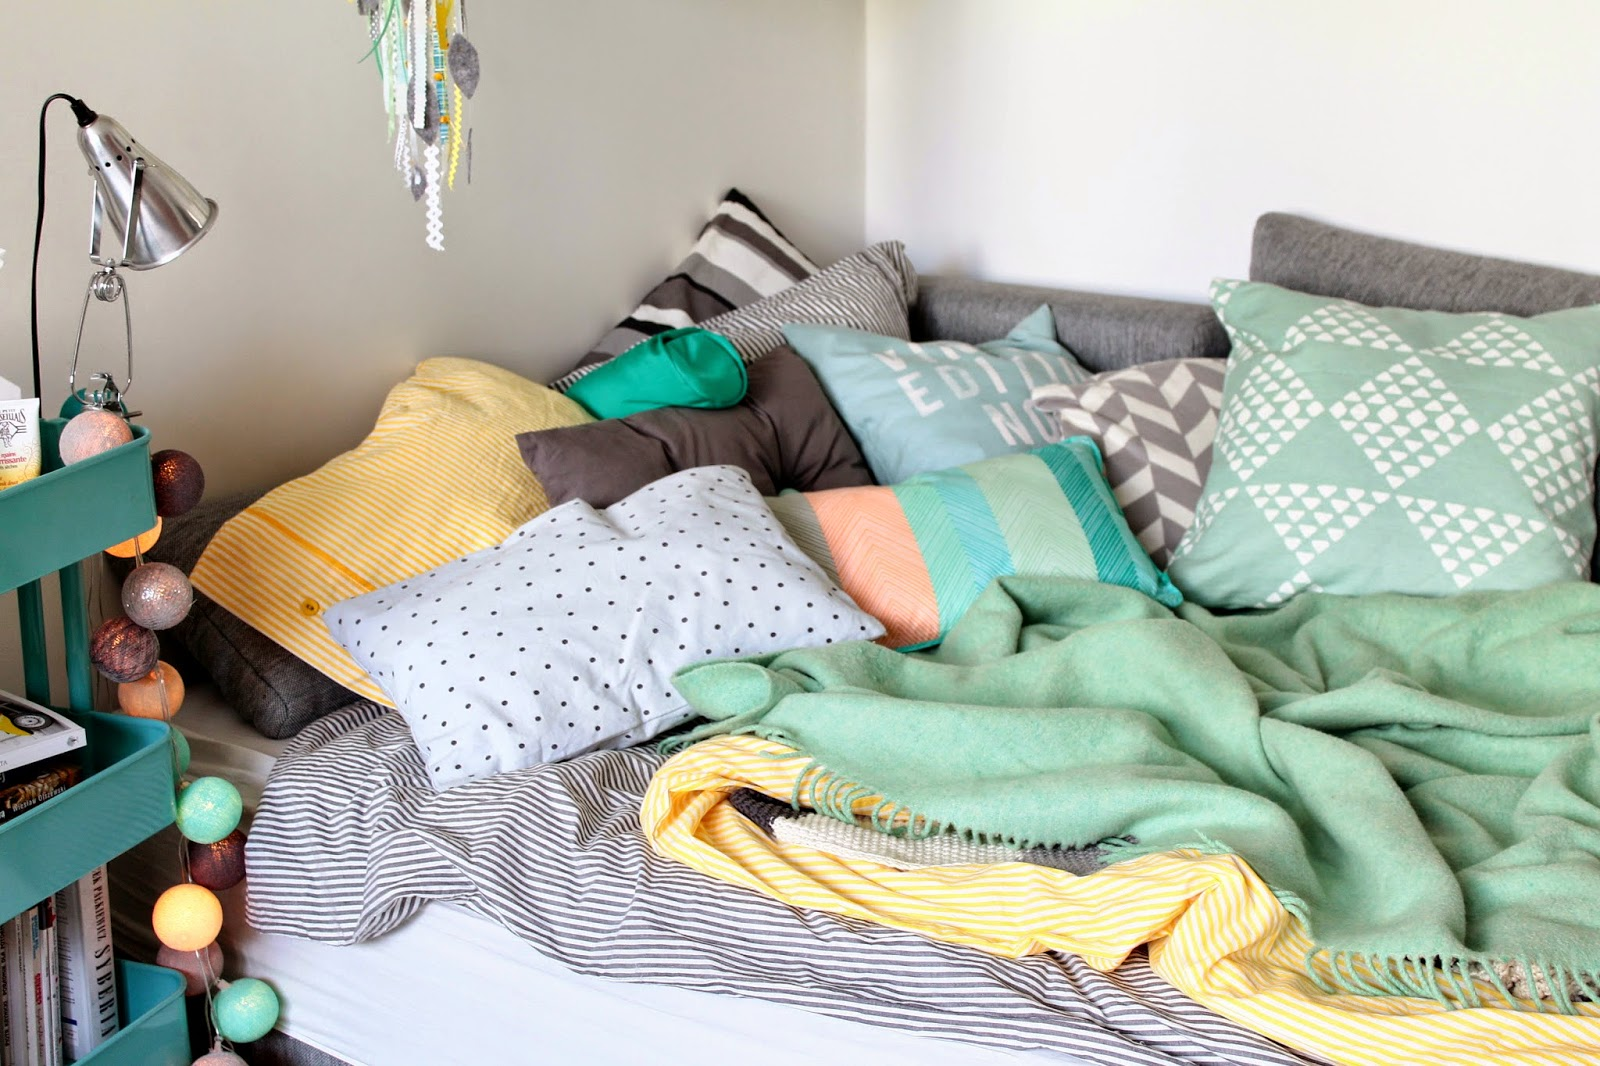 Jak się śpi w kawalerce